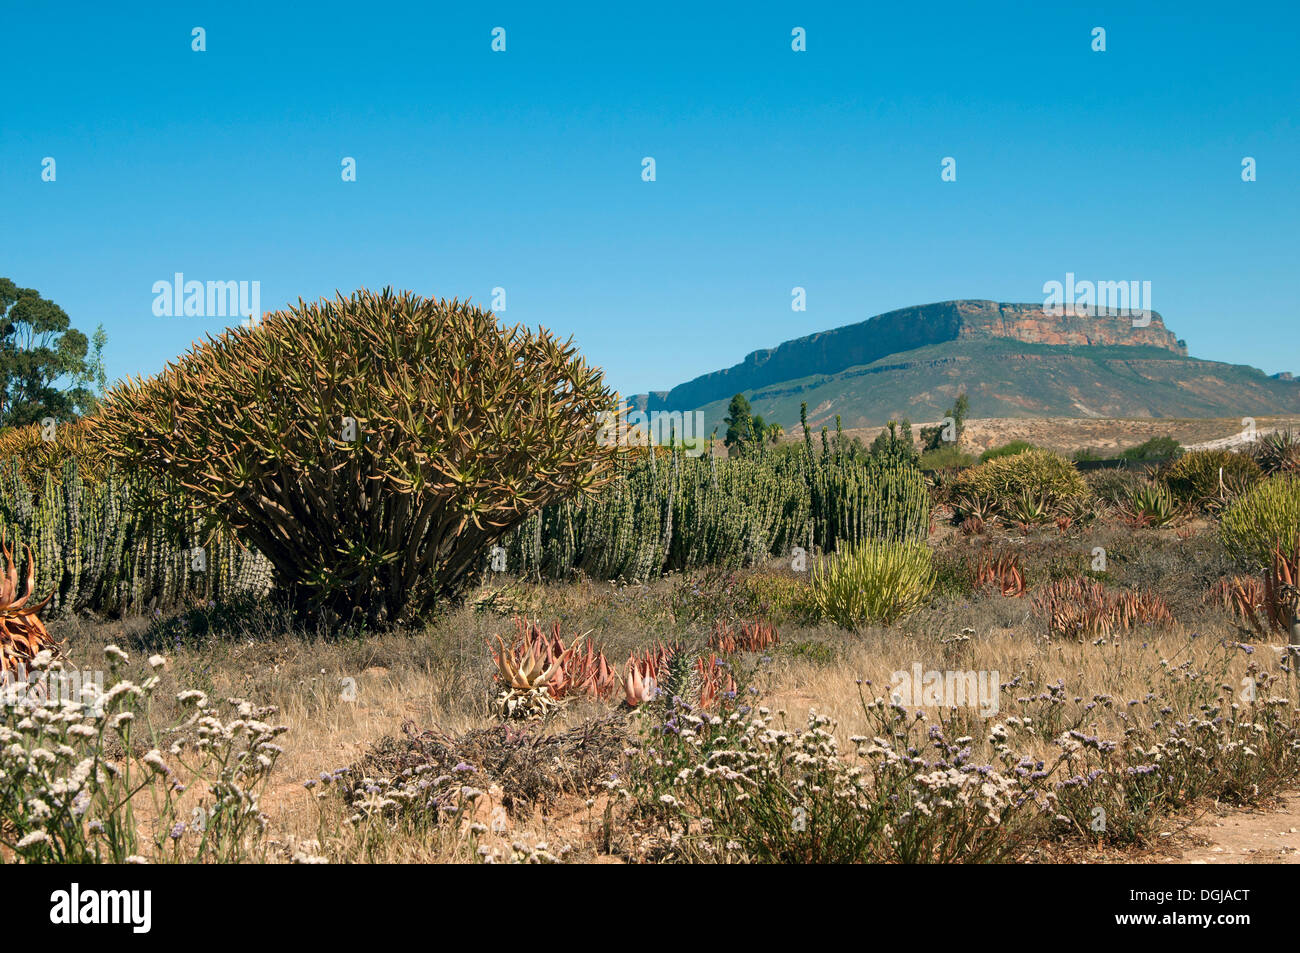 "Garden area of the world's largest succulent nursery ""Kokerboom"", Vanrhynsdorp, Western Cape, South Africa - Stock Image"